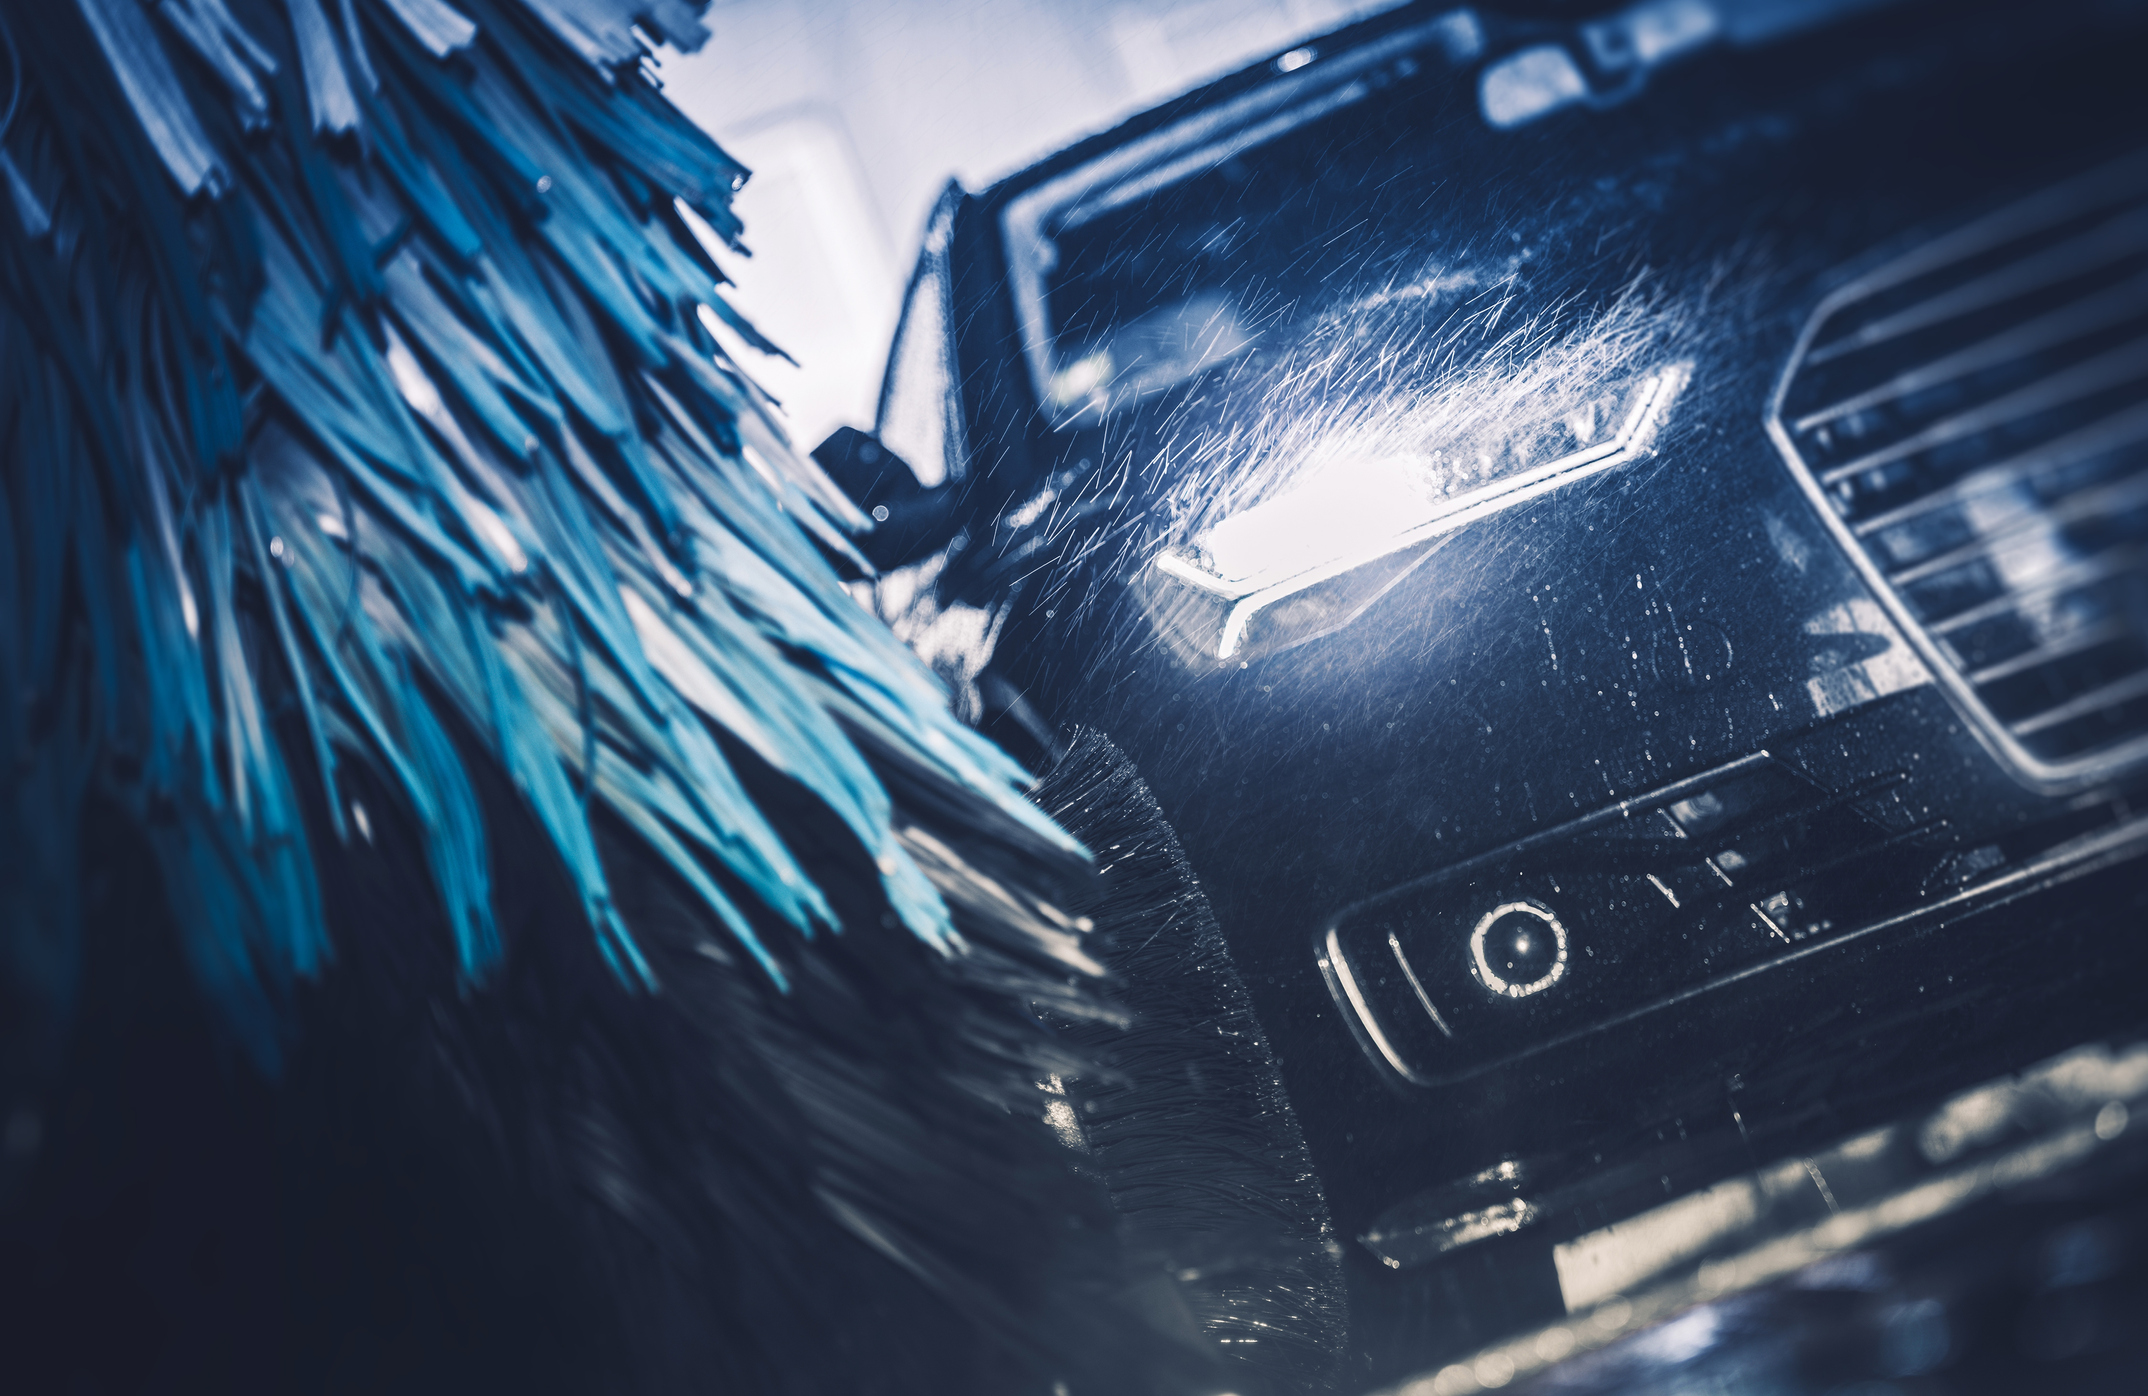 Vaskehøyde 2,95 m! - Stor bil er ingen problem! Her kan du vaske Springer eller Crafter uten bekymringer.Åpent 24/7